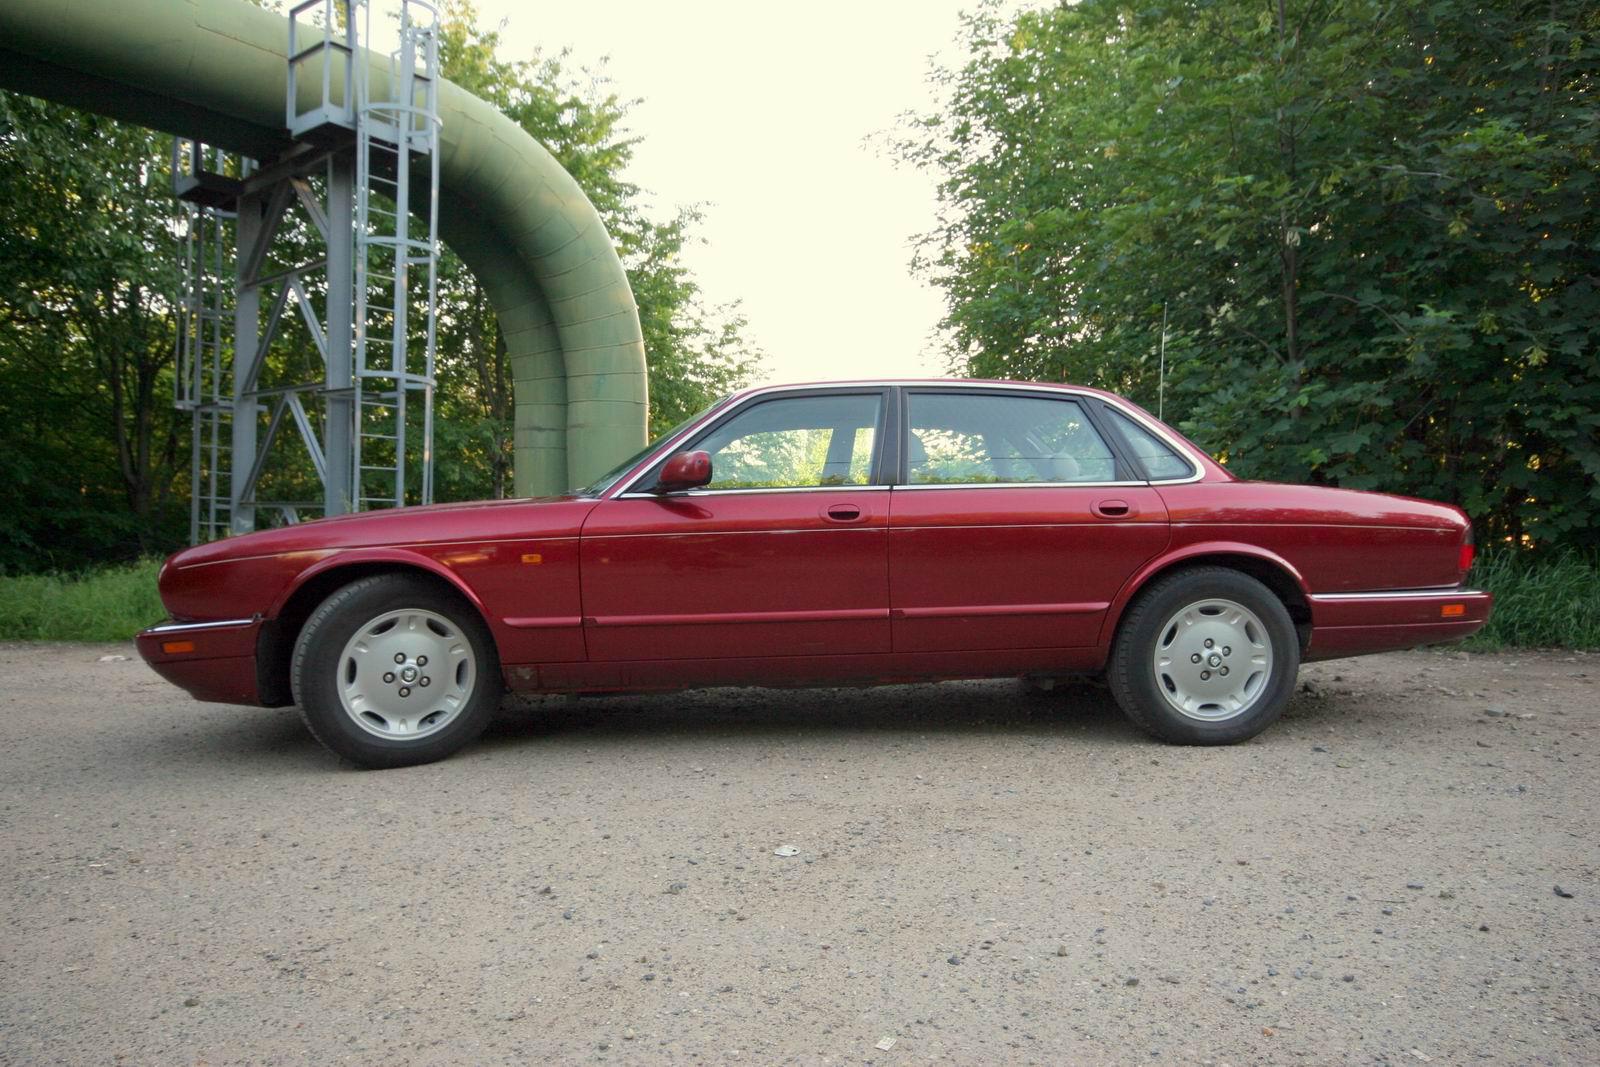 1996 Jaguar Xj X300 Xj6 32 198 Cui Gasoline 155 Kw 287 Nm Vanden Plas